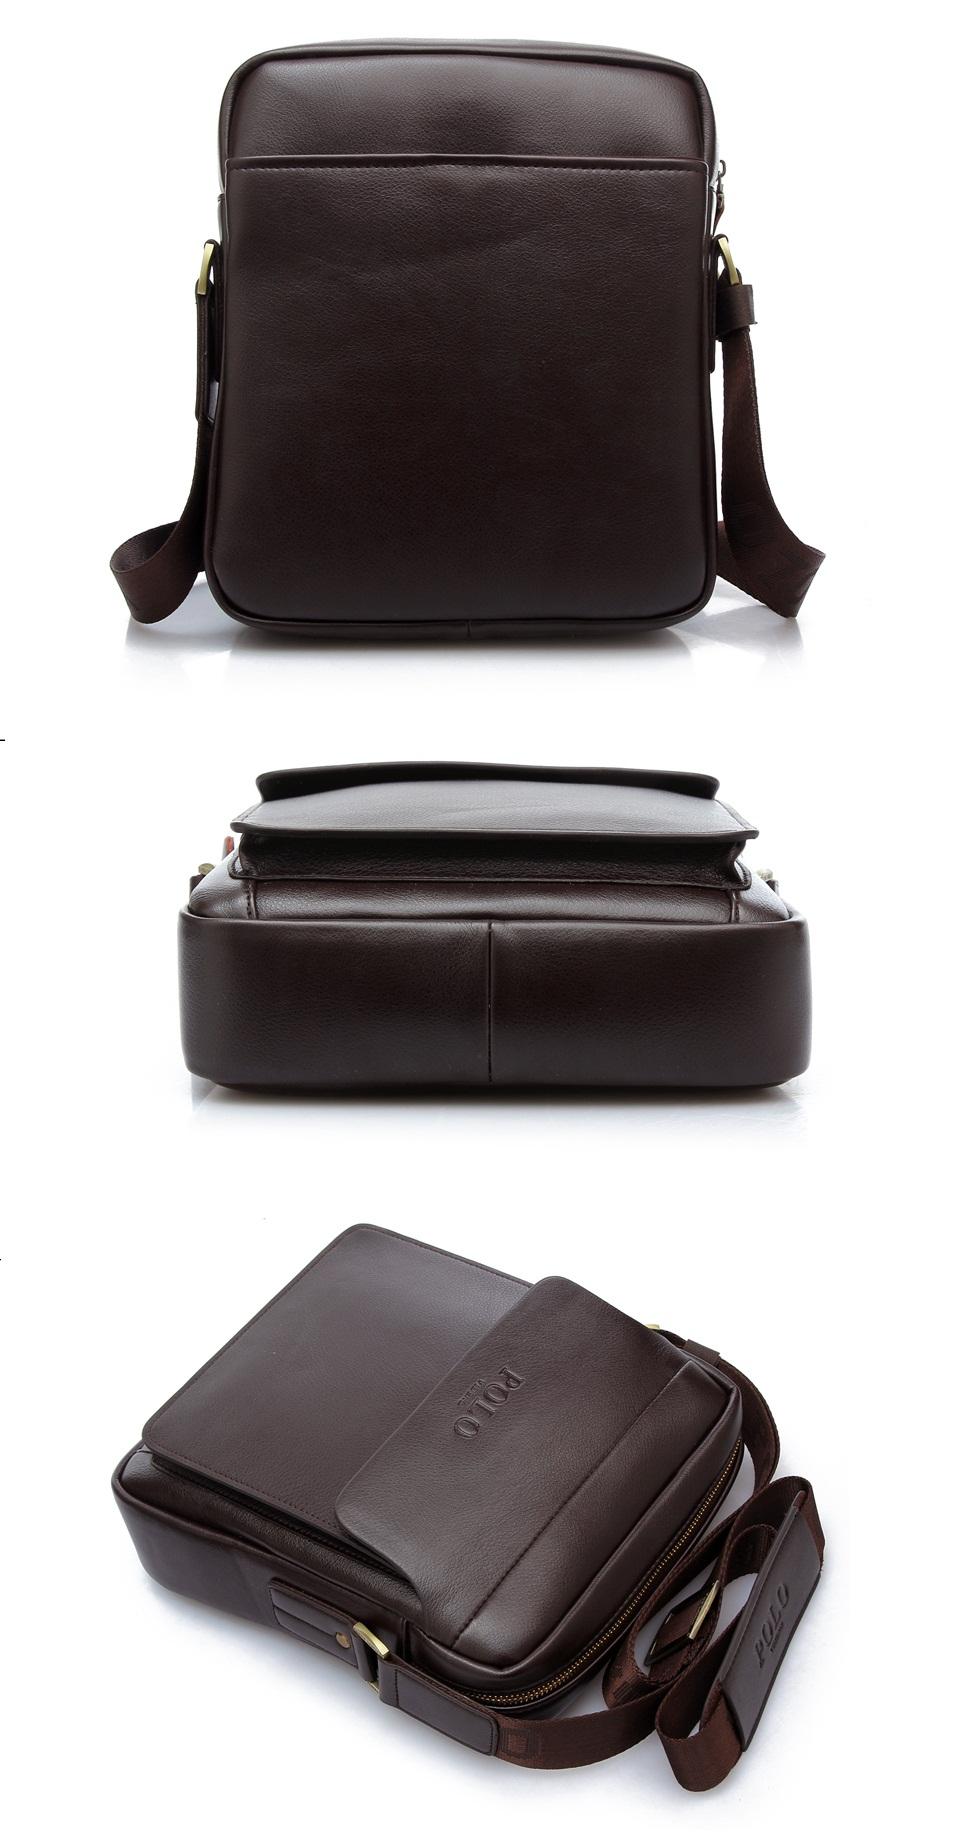 Mặt sau túi đựng ipad Polo_Pl05